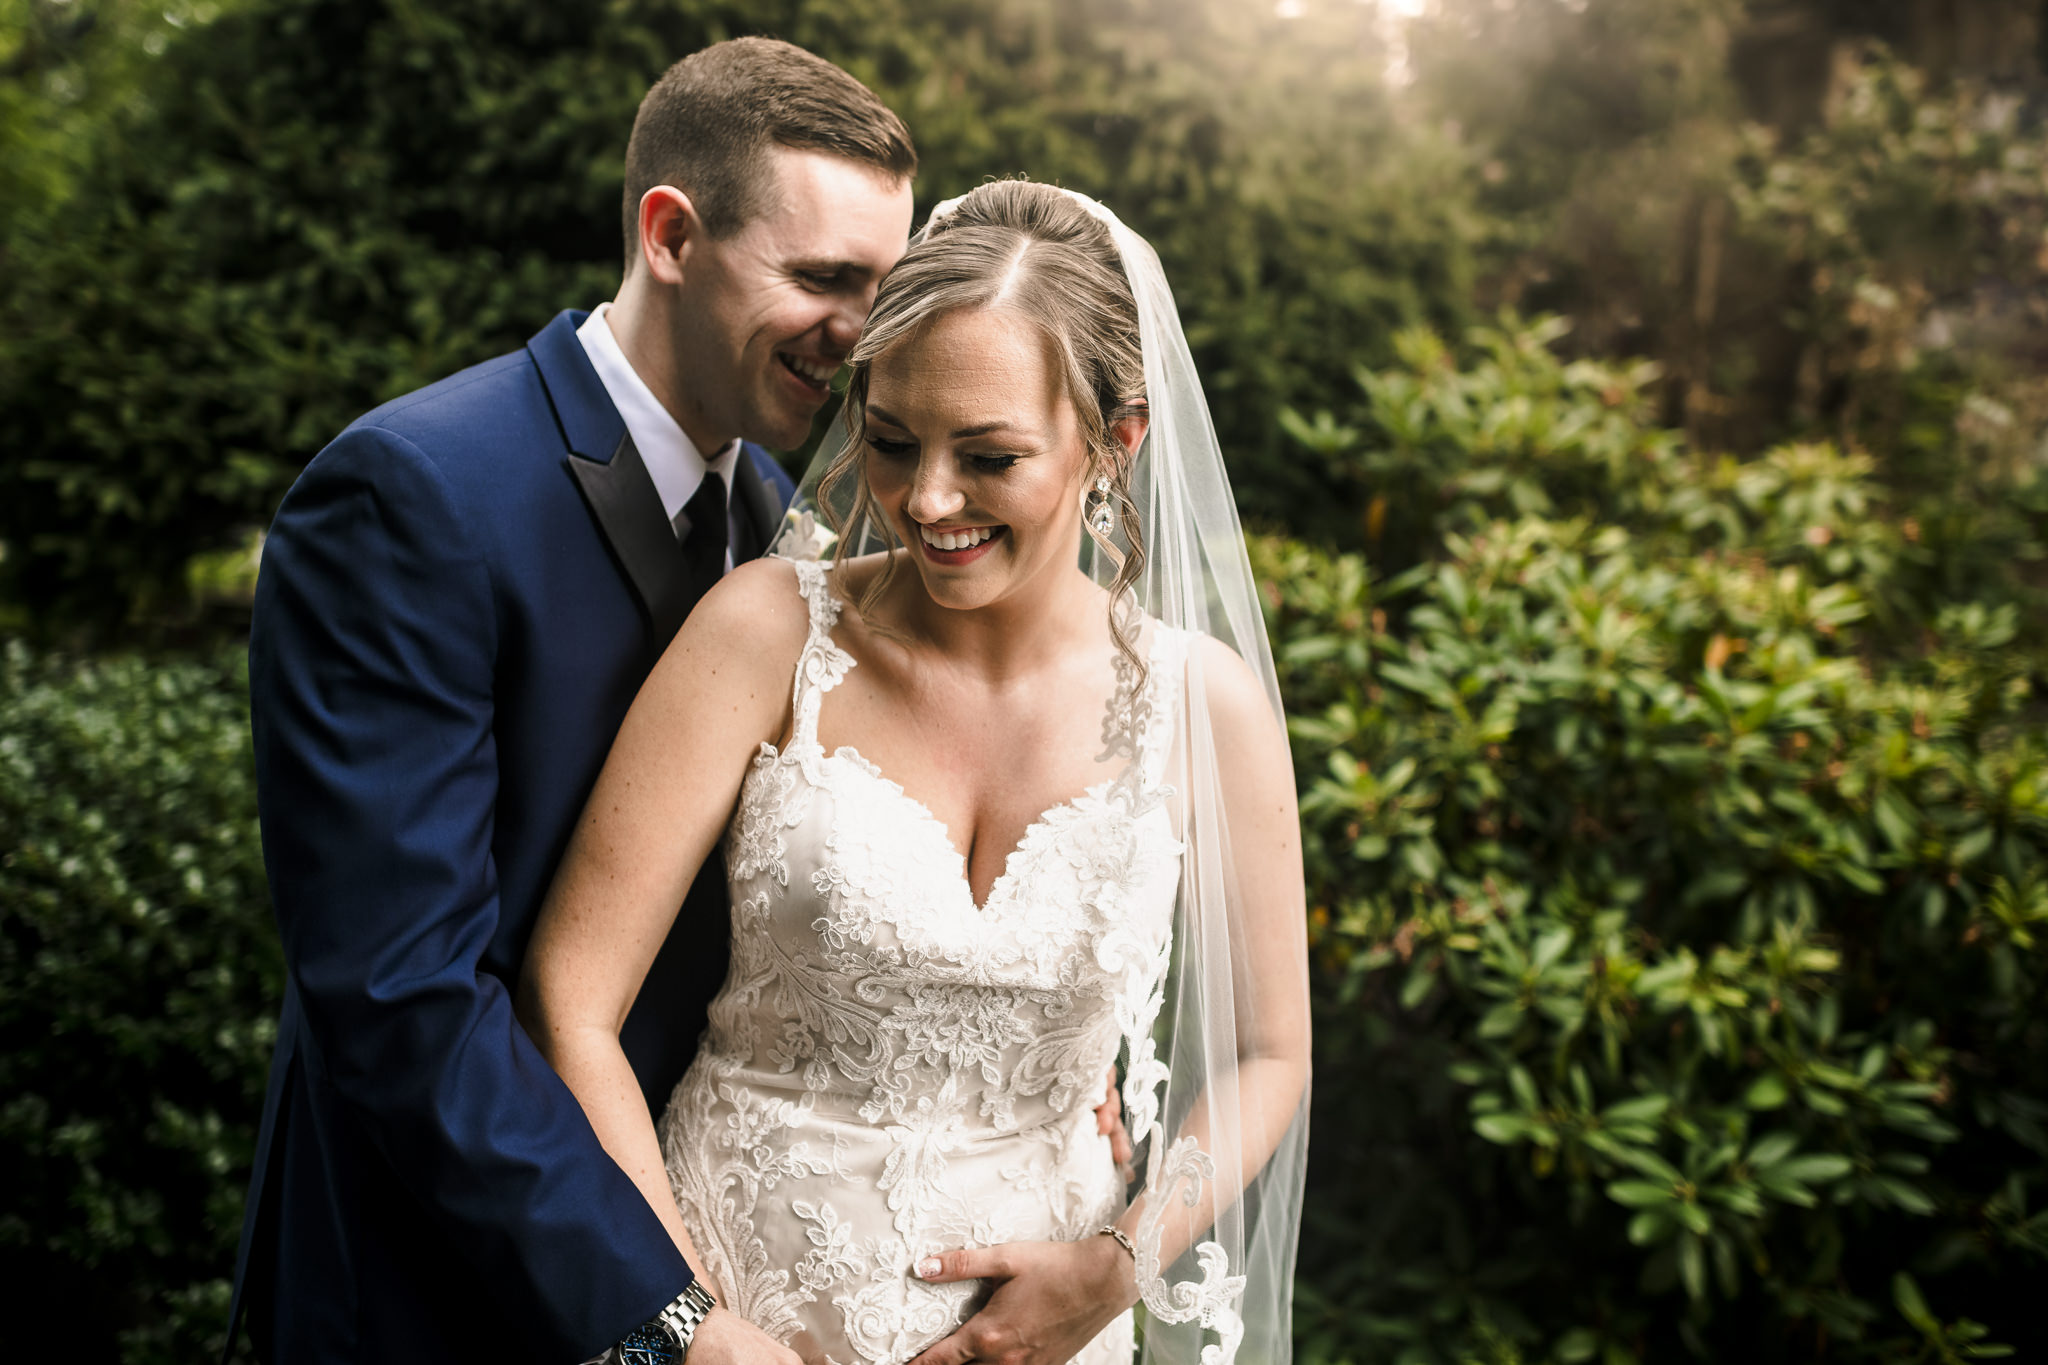 Brennan-South-Gate-Manor-New-Jersey-Wedding-Photographer-12.JPG